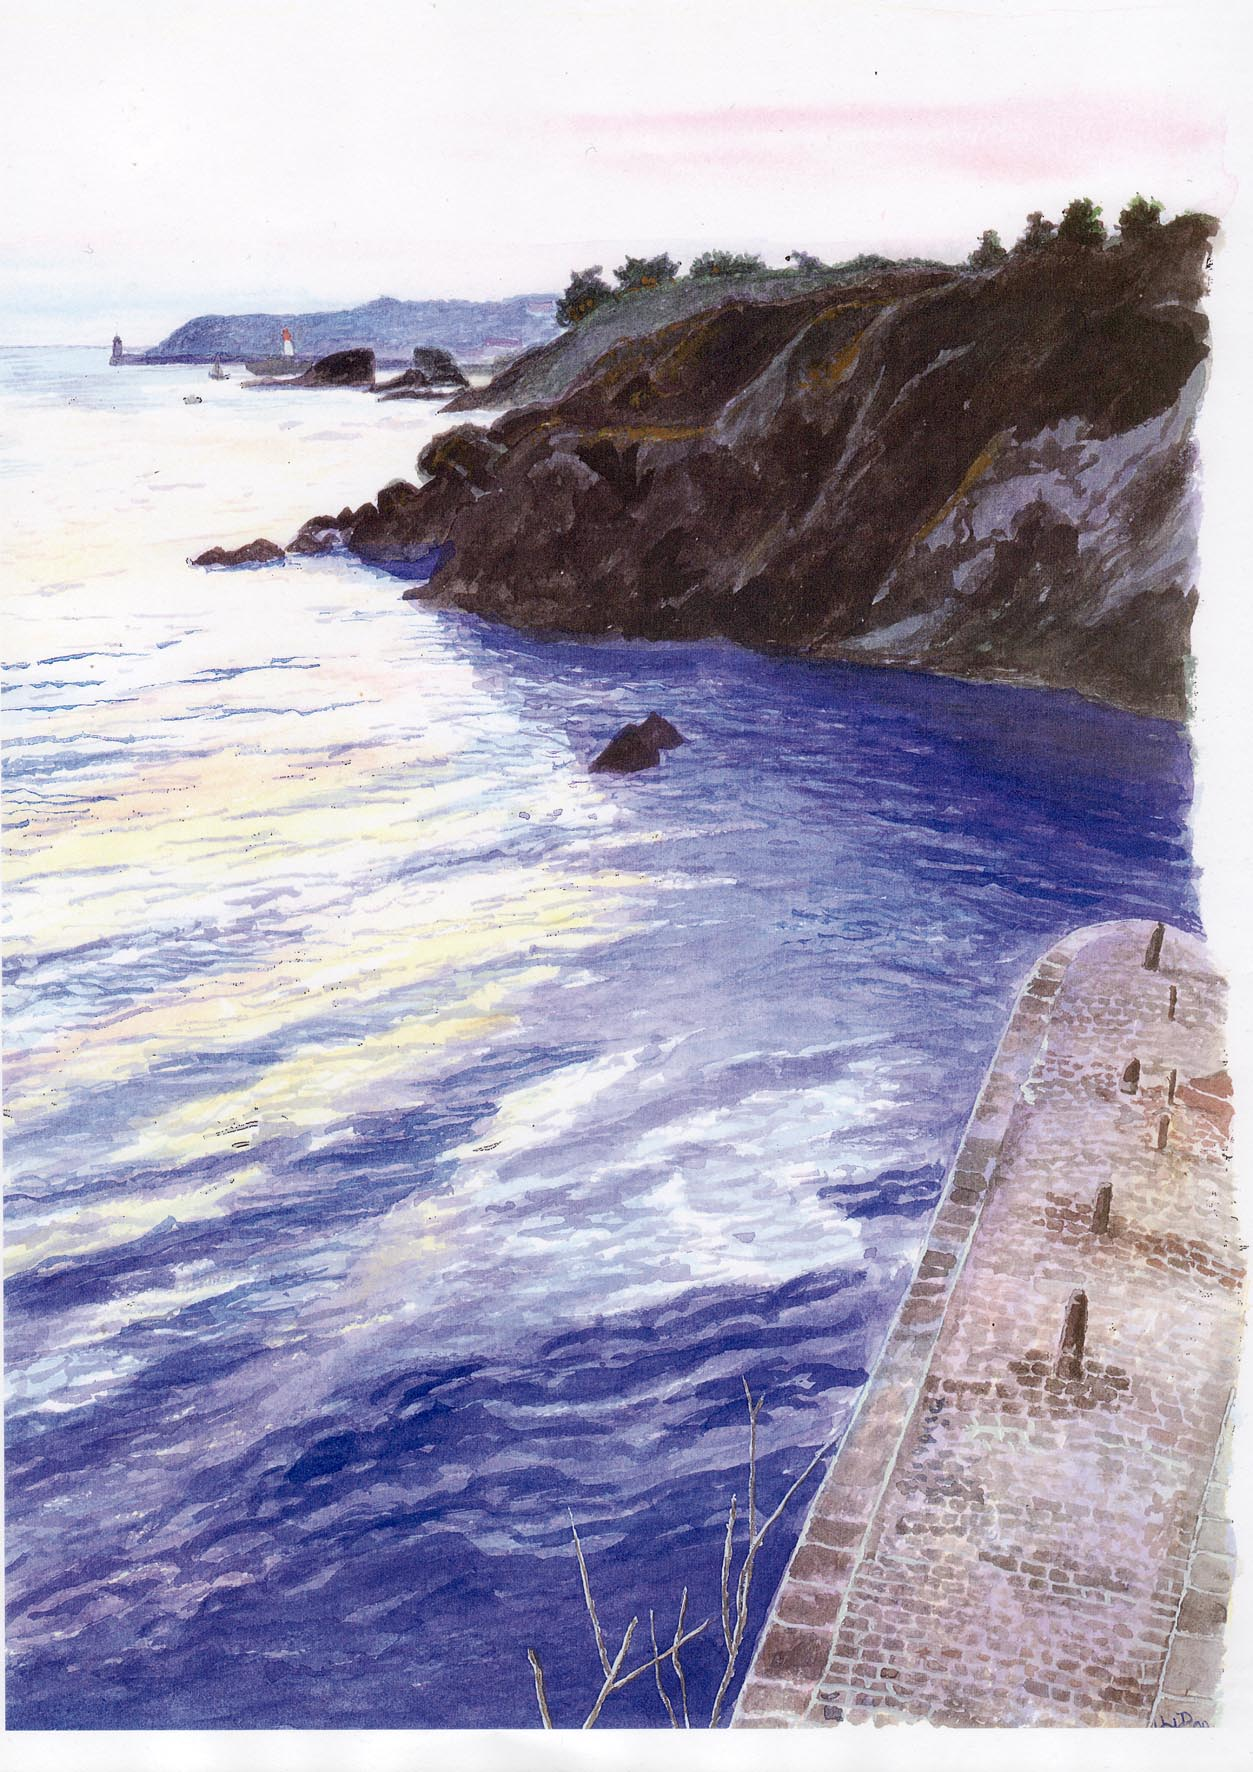 Groix, Port Lay